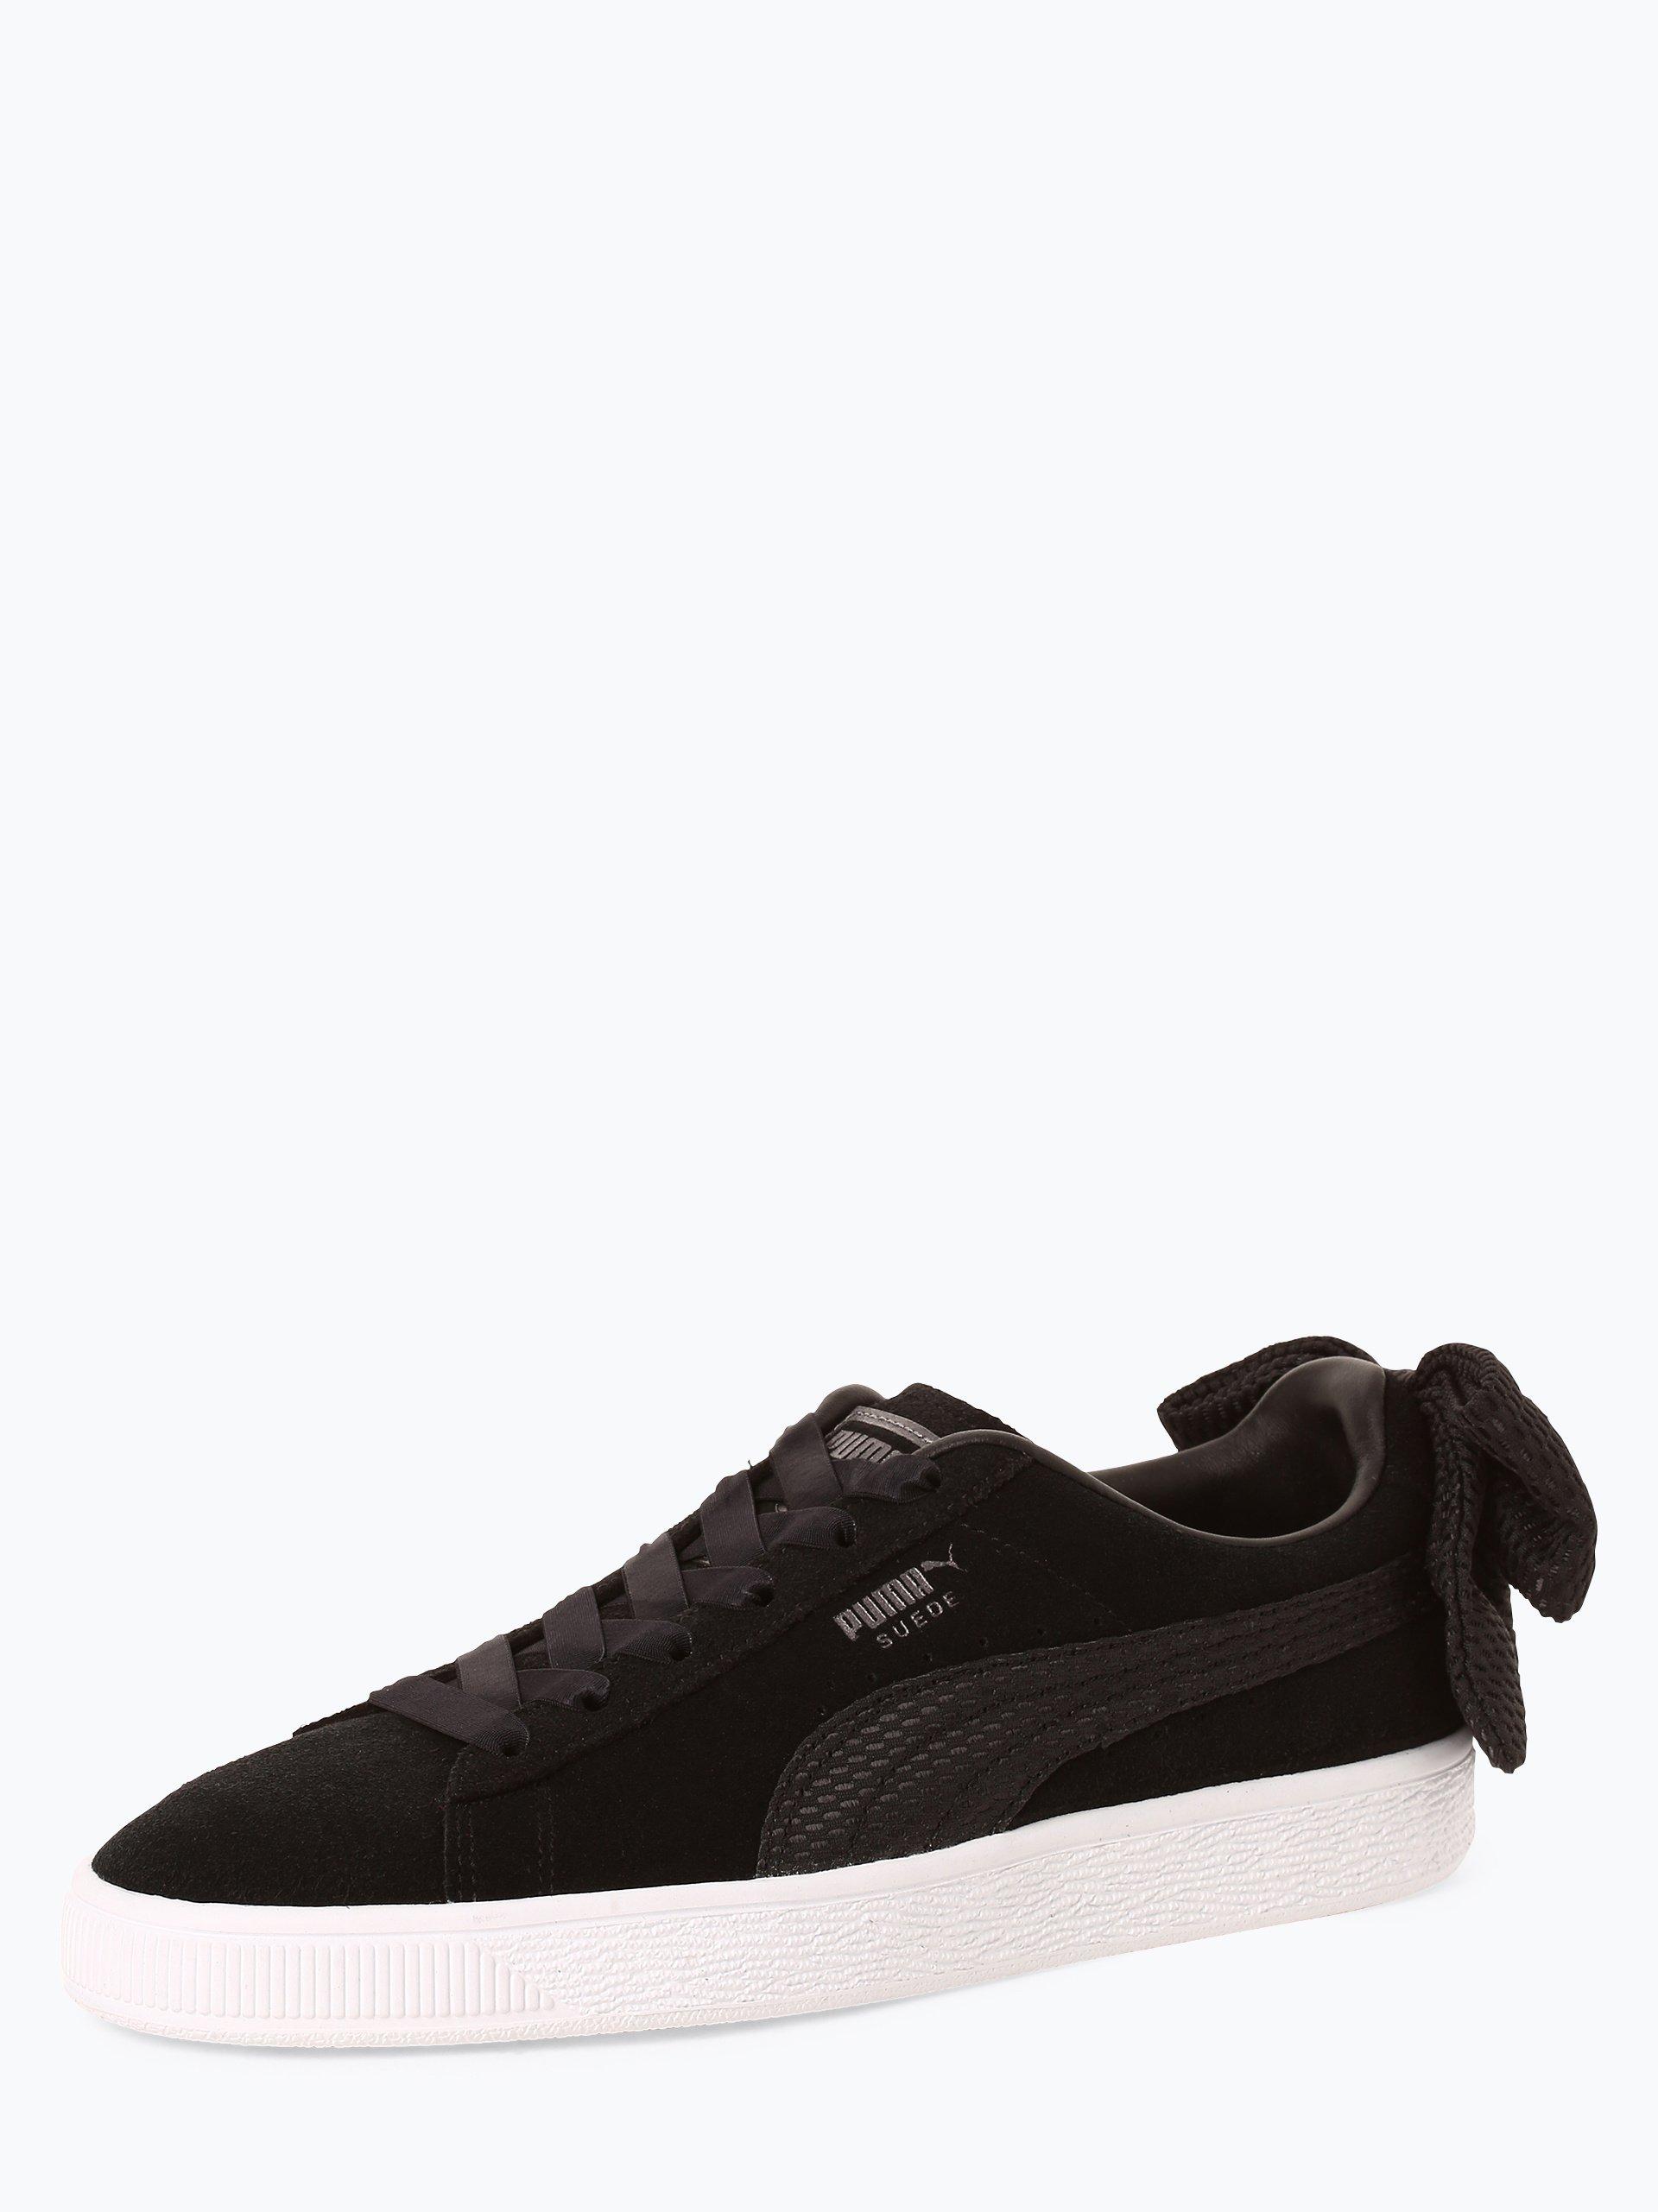 Puma Damen Sneaker aus Leder - Suede Bow Uprising